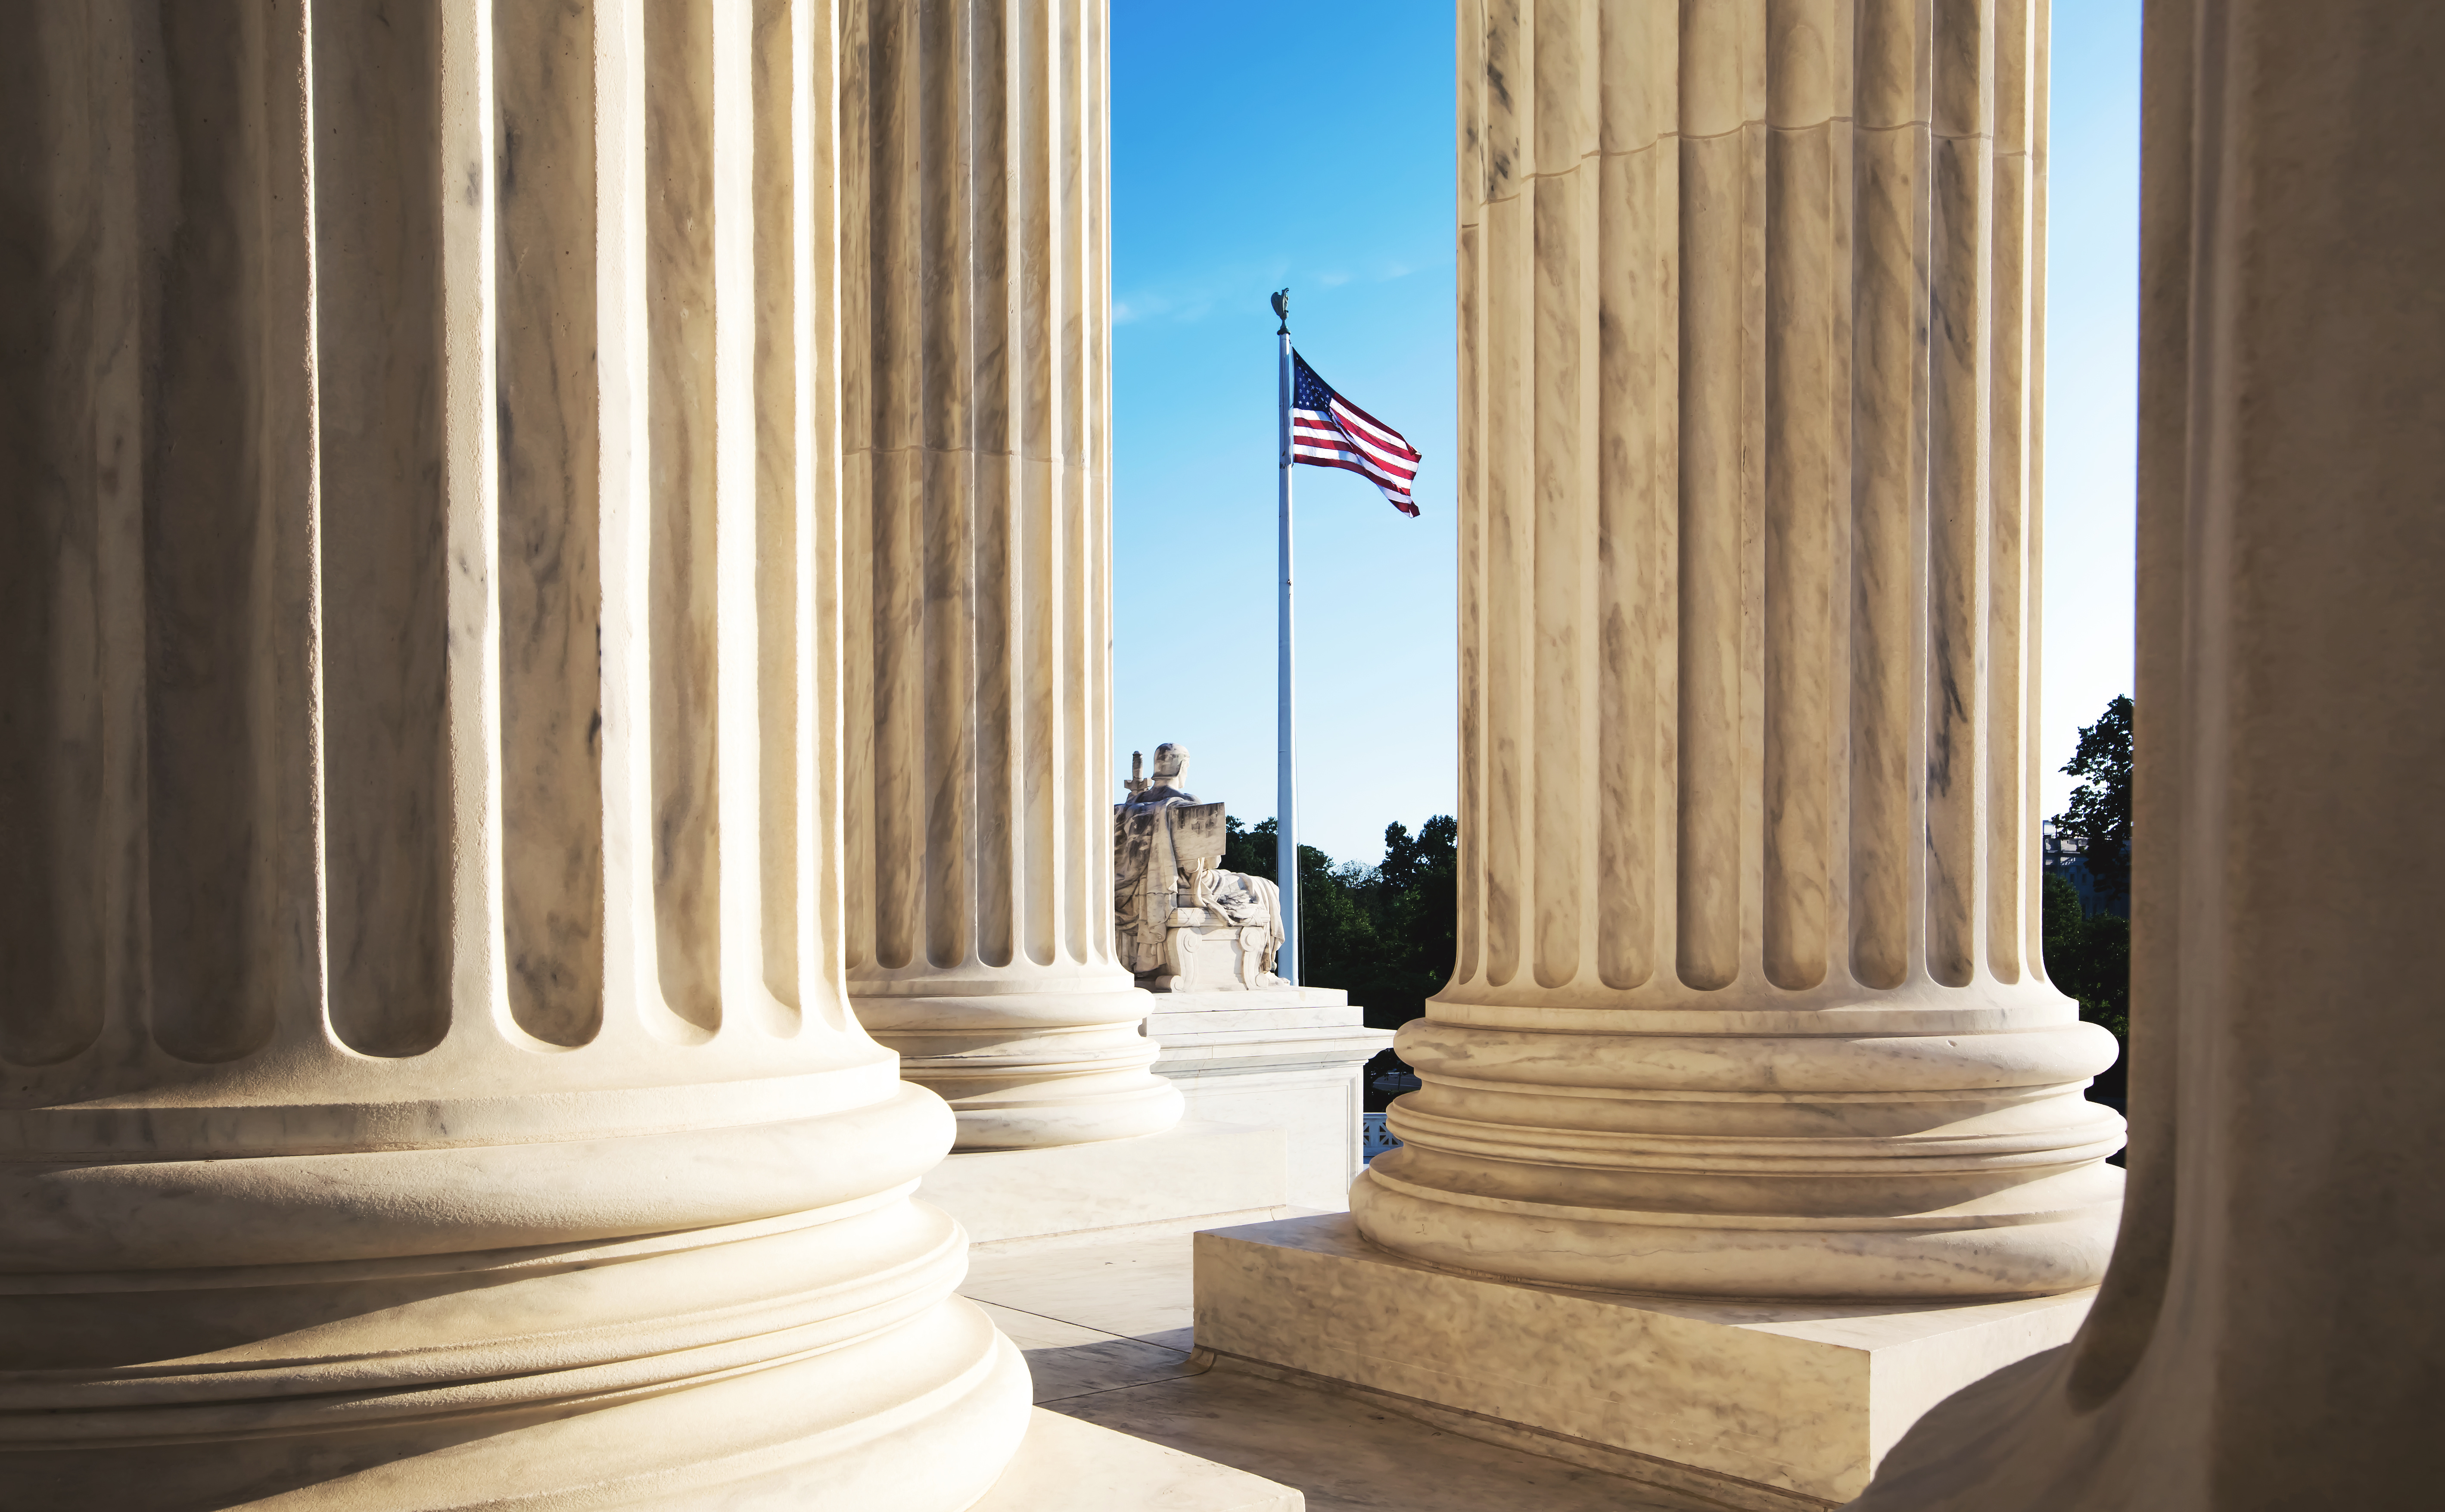 2020 Annual Supreme Court Round Up